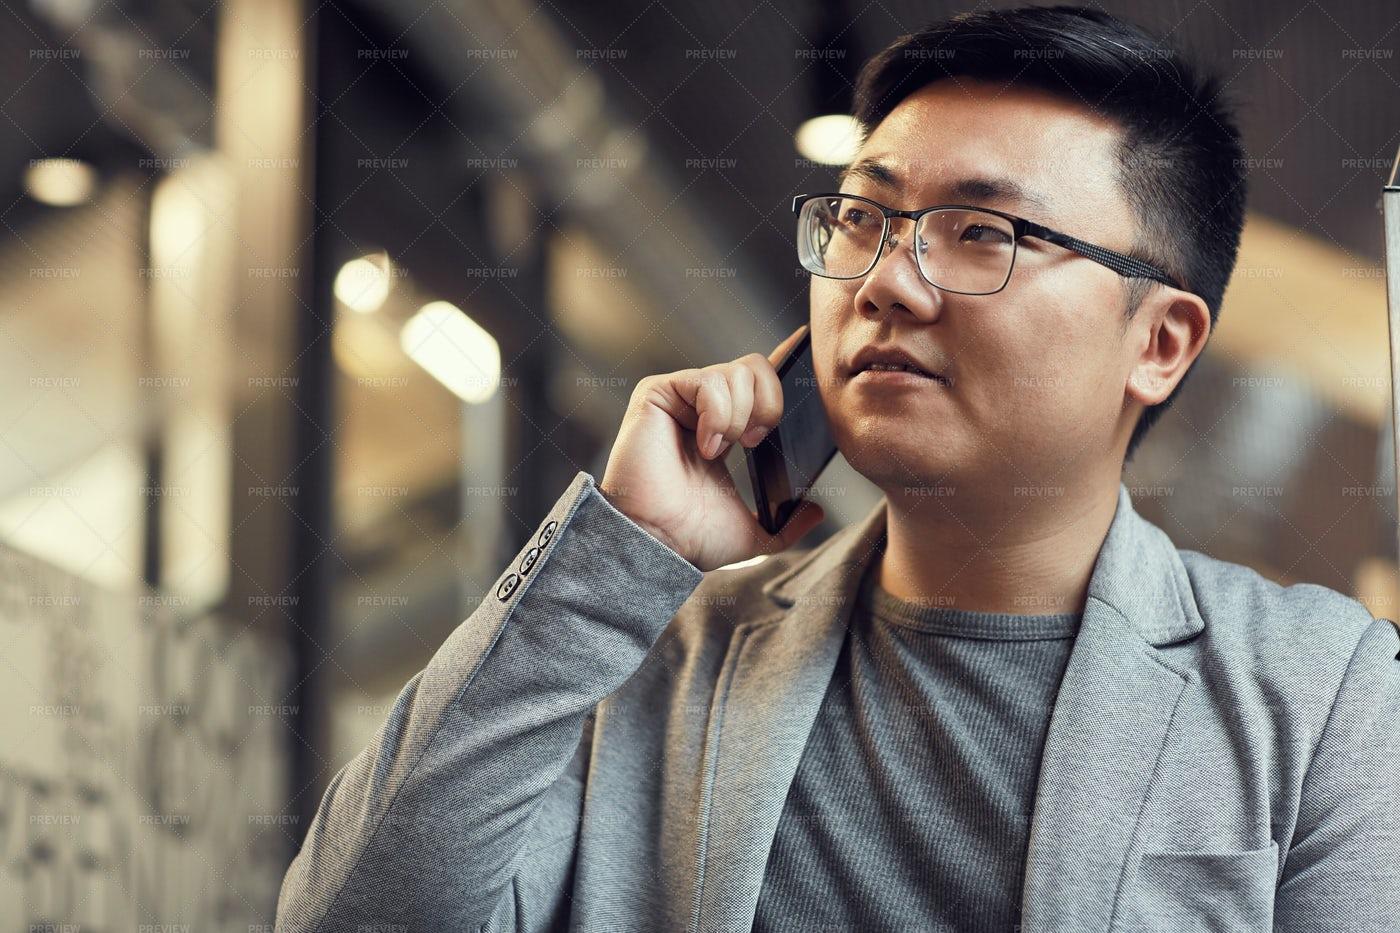 Businessman On Phone: Stock Photos